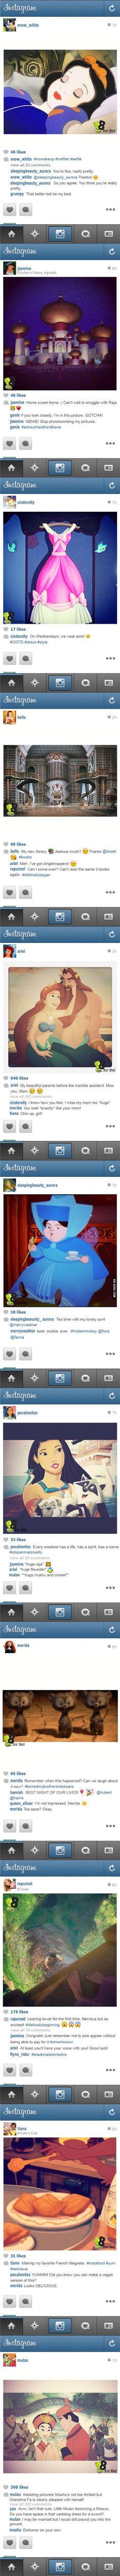 If Disney Princesses Had Instagram! Lol